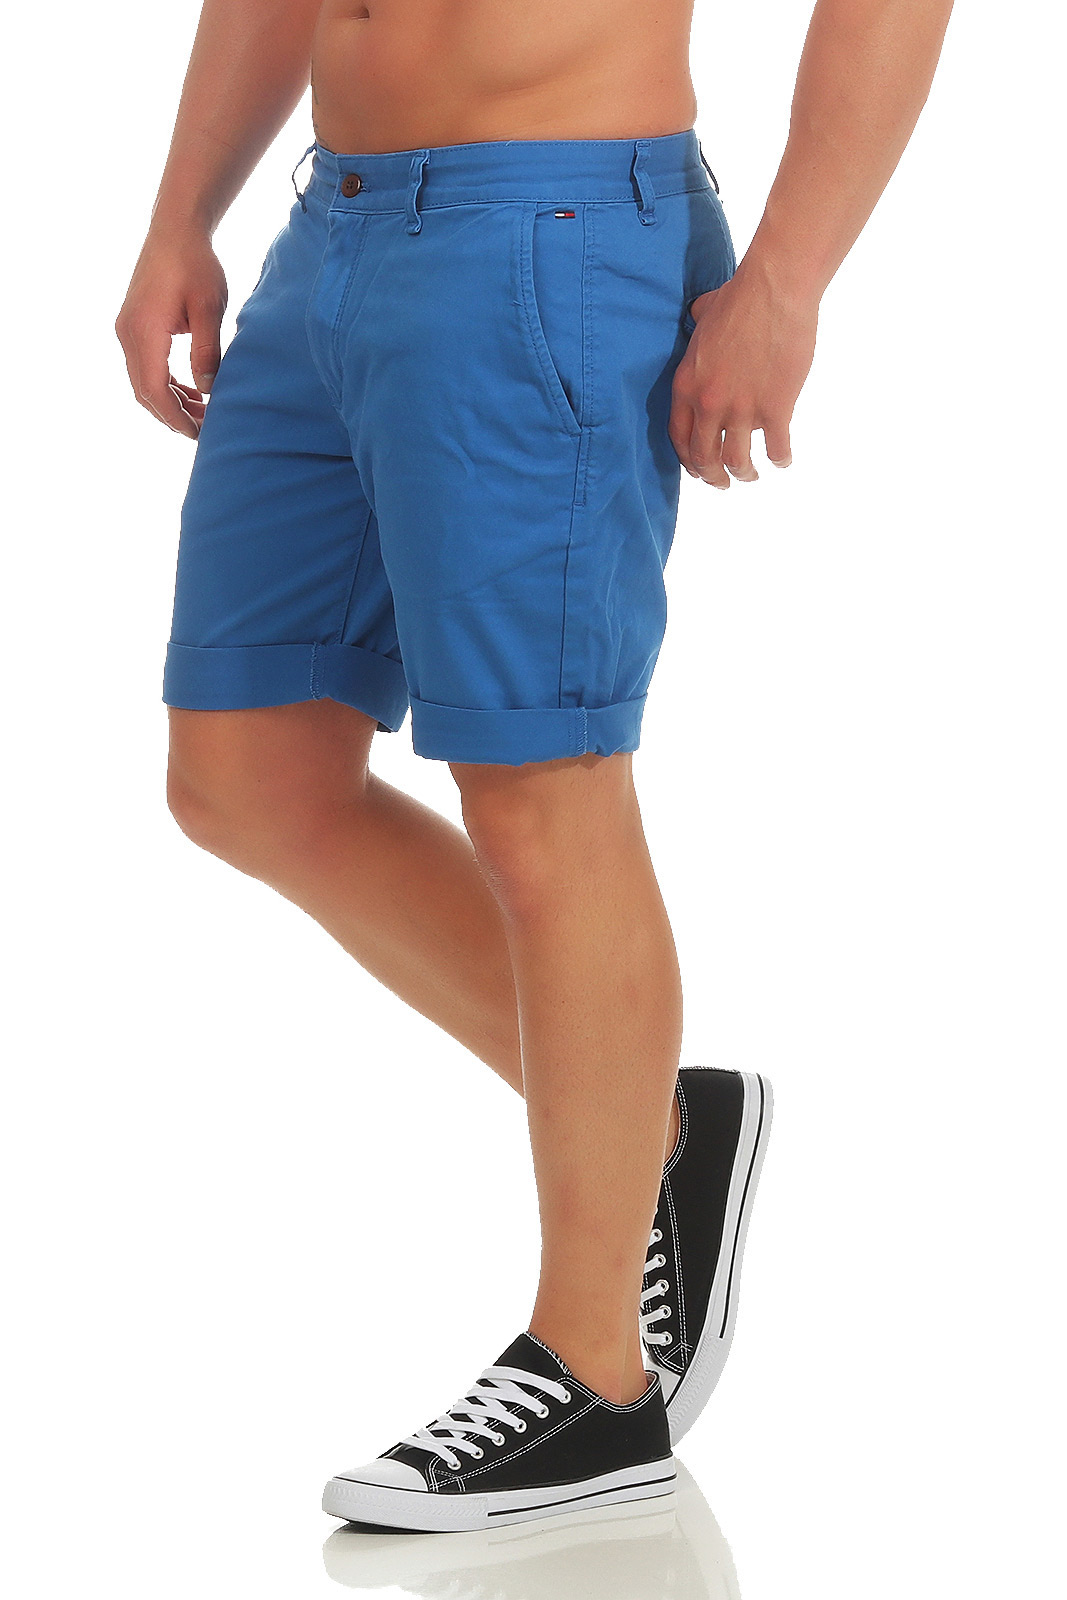 Tommy-HILFIGER-Jeans-uomo-Freddy-Short-Shorts-Pantaloni-Corti-Estate-Straight-Fit